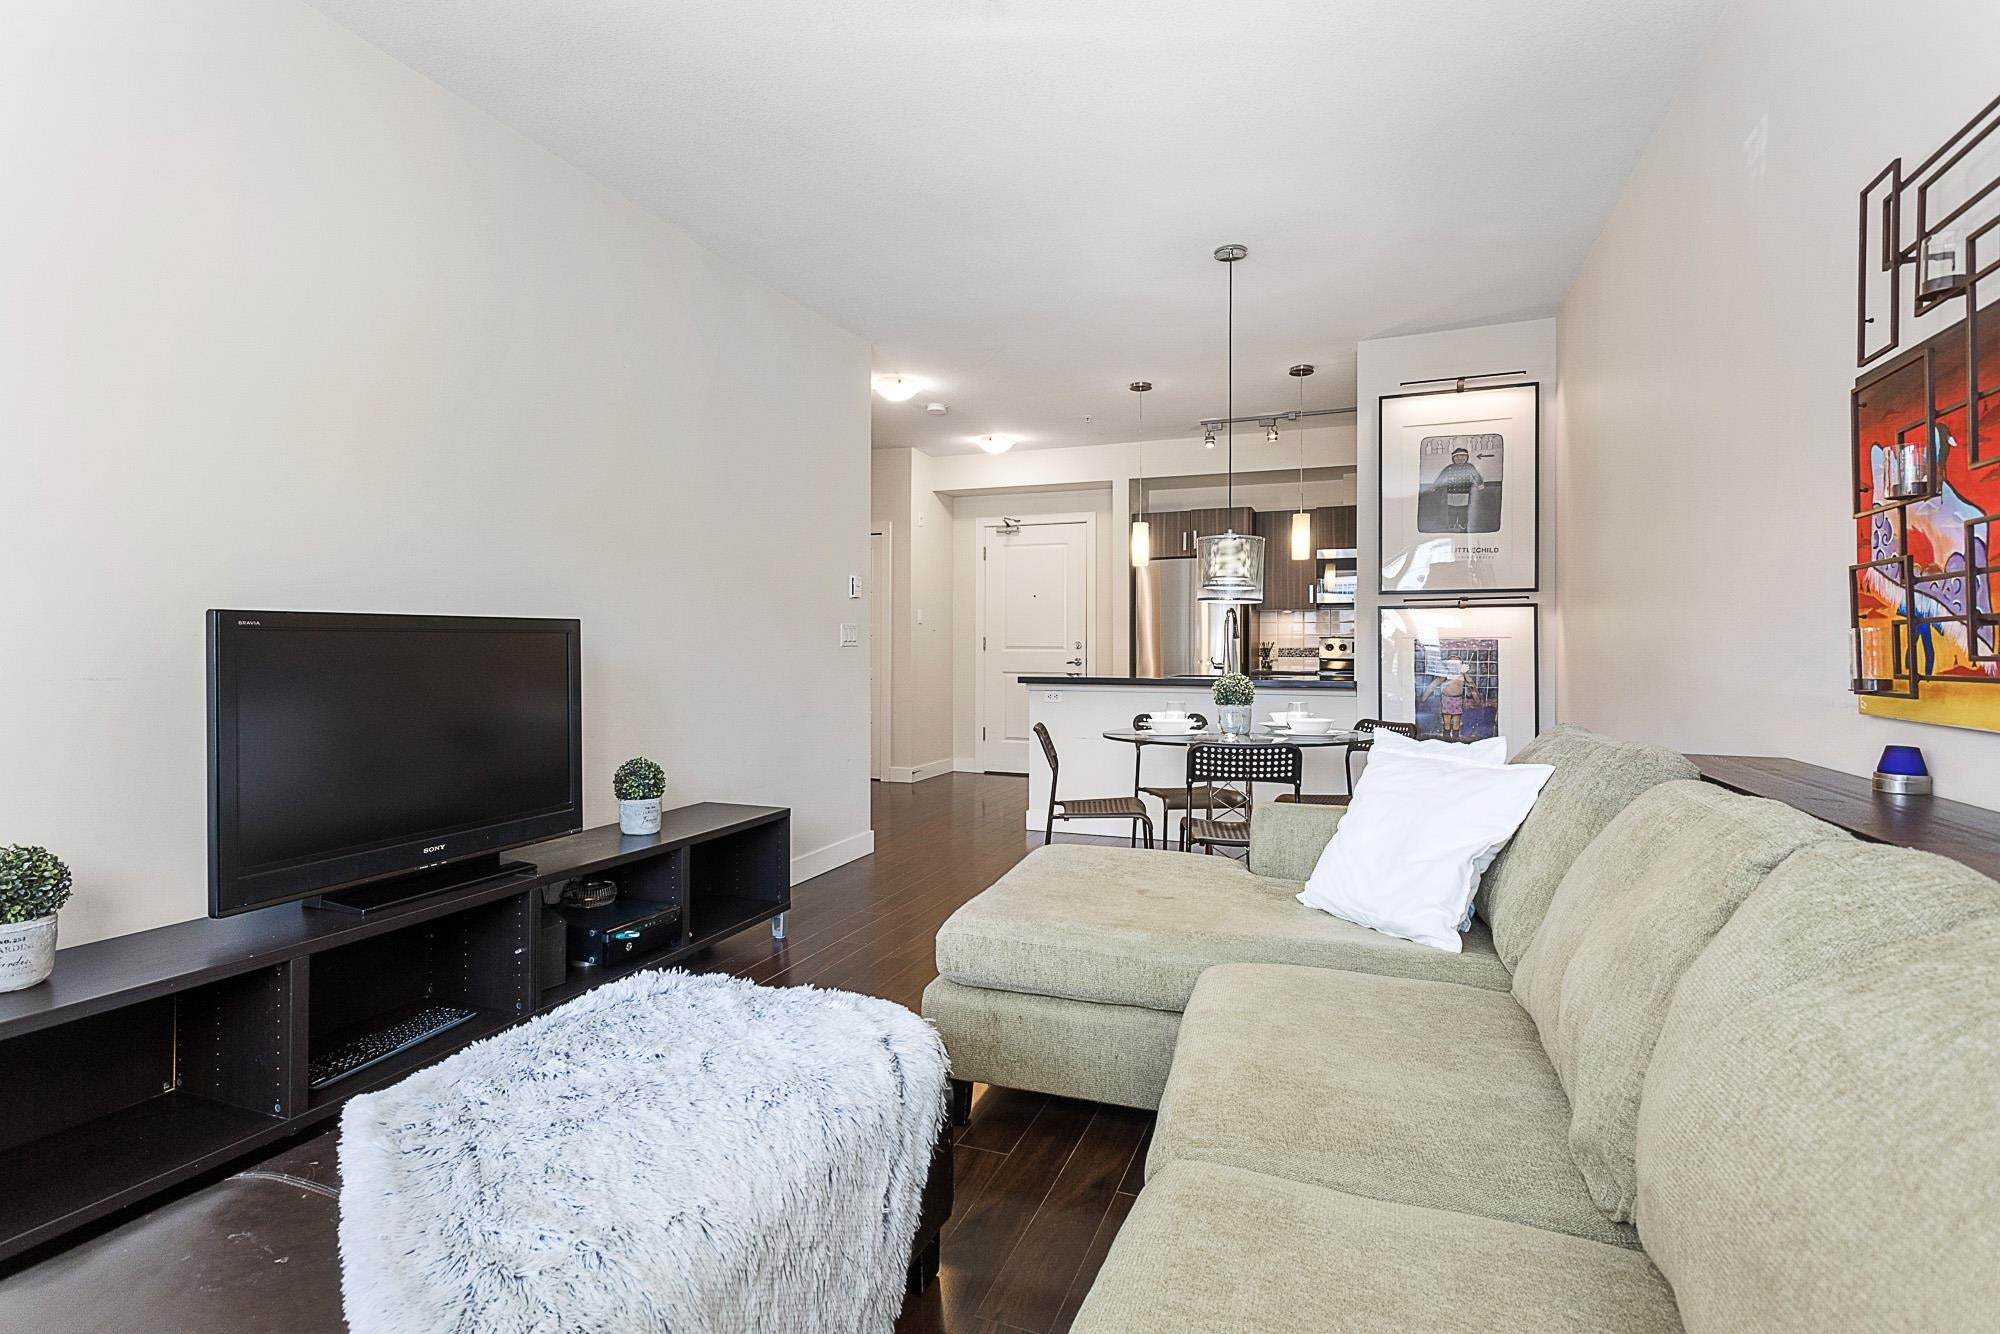 114 20219 54A AVENUE - Langley City Apartment/Condo for sale, 1 Bedroom (R2616172) - #16